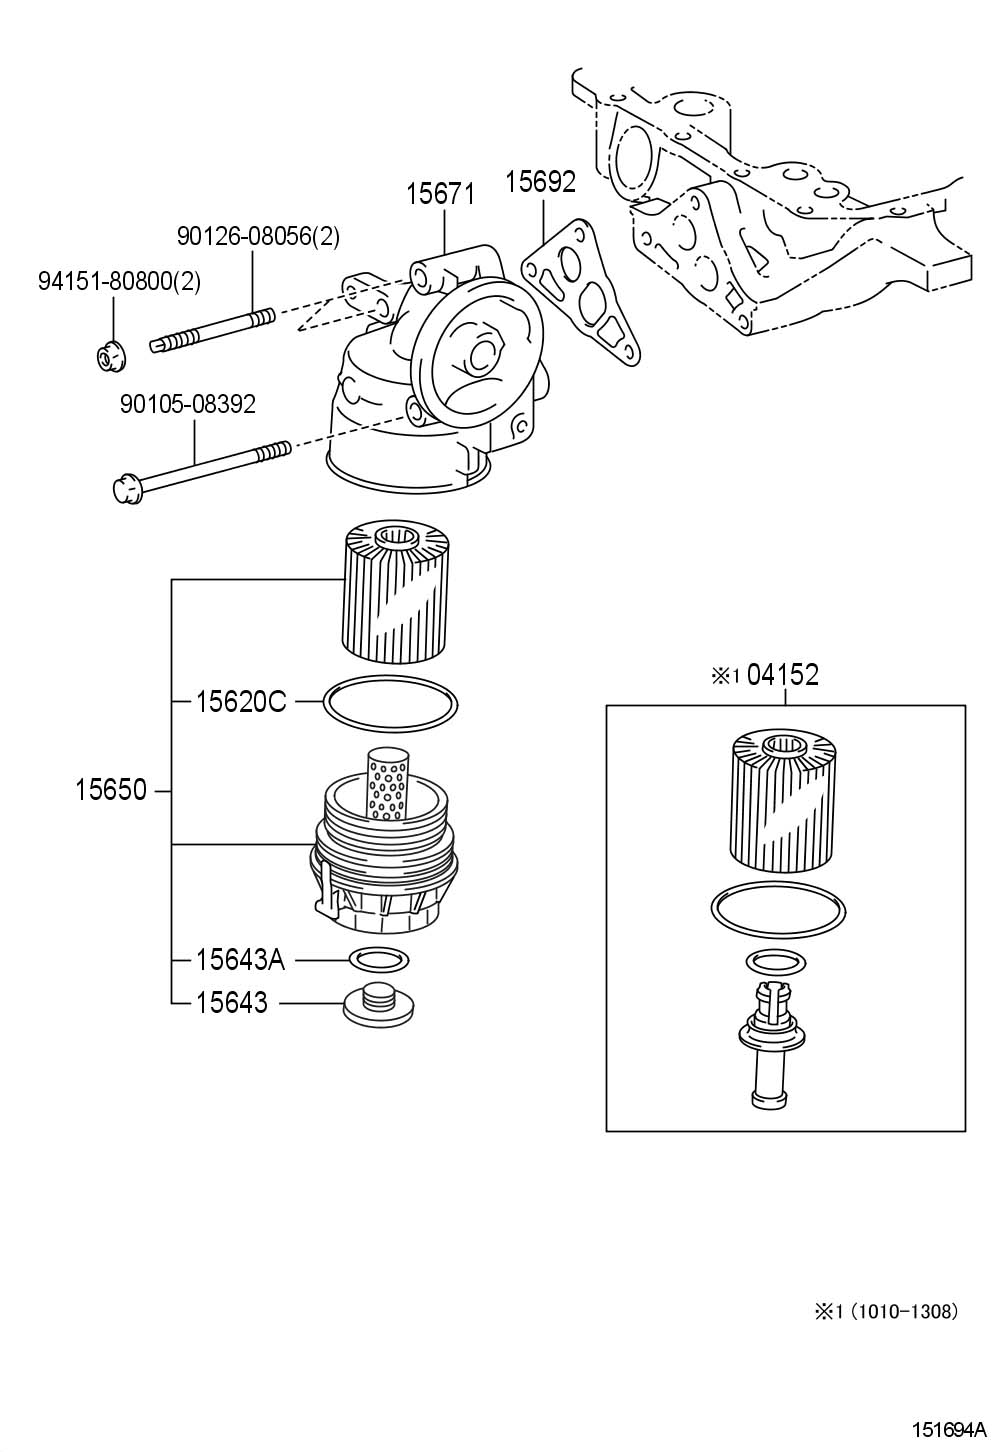 Toyota Tundra Gasket, oil filter bracket. Efi, dohc, valve